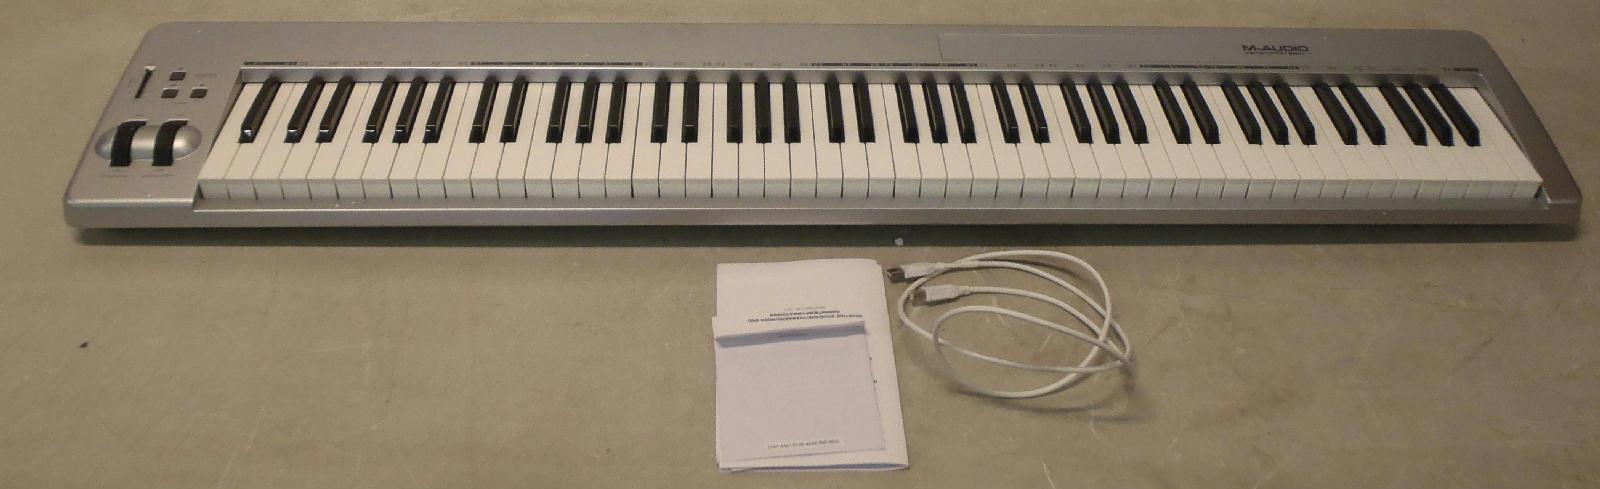 m audio keystation 88es 88 key usb midi keyboard controller semi weighted keys 724643115333 ebay. Black Bedroom Furniture Sets. Home Design Ideas